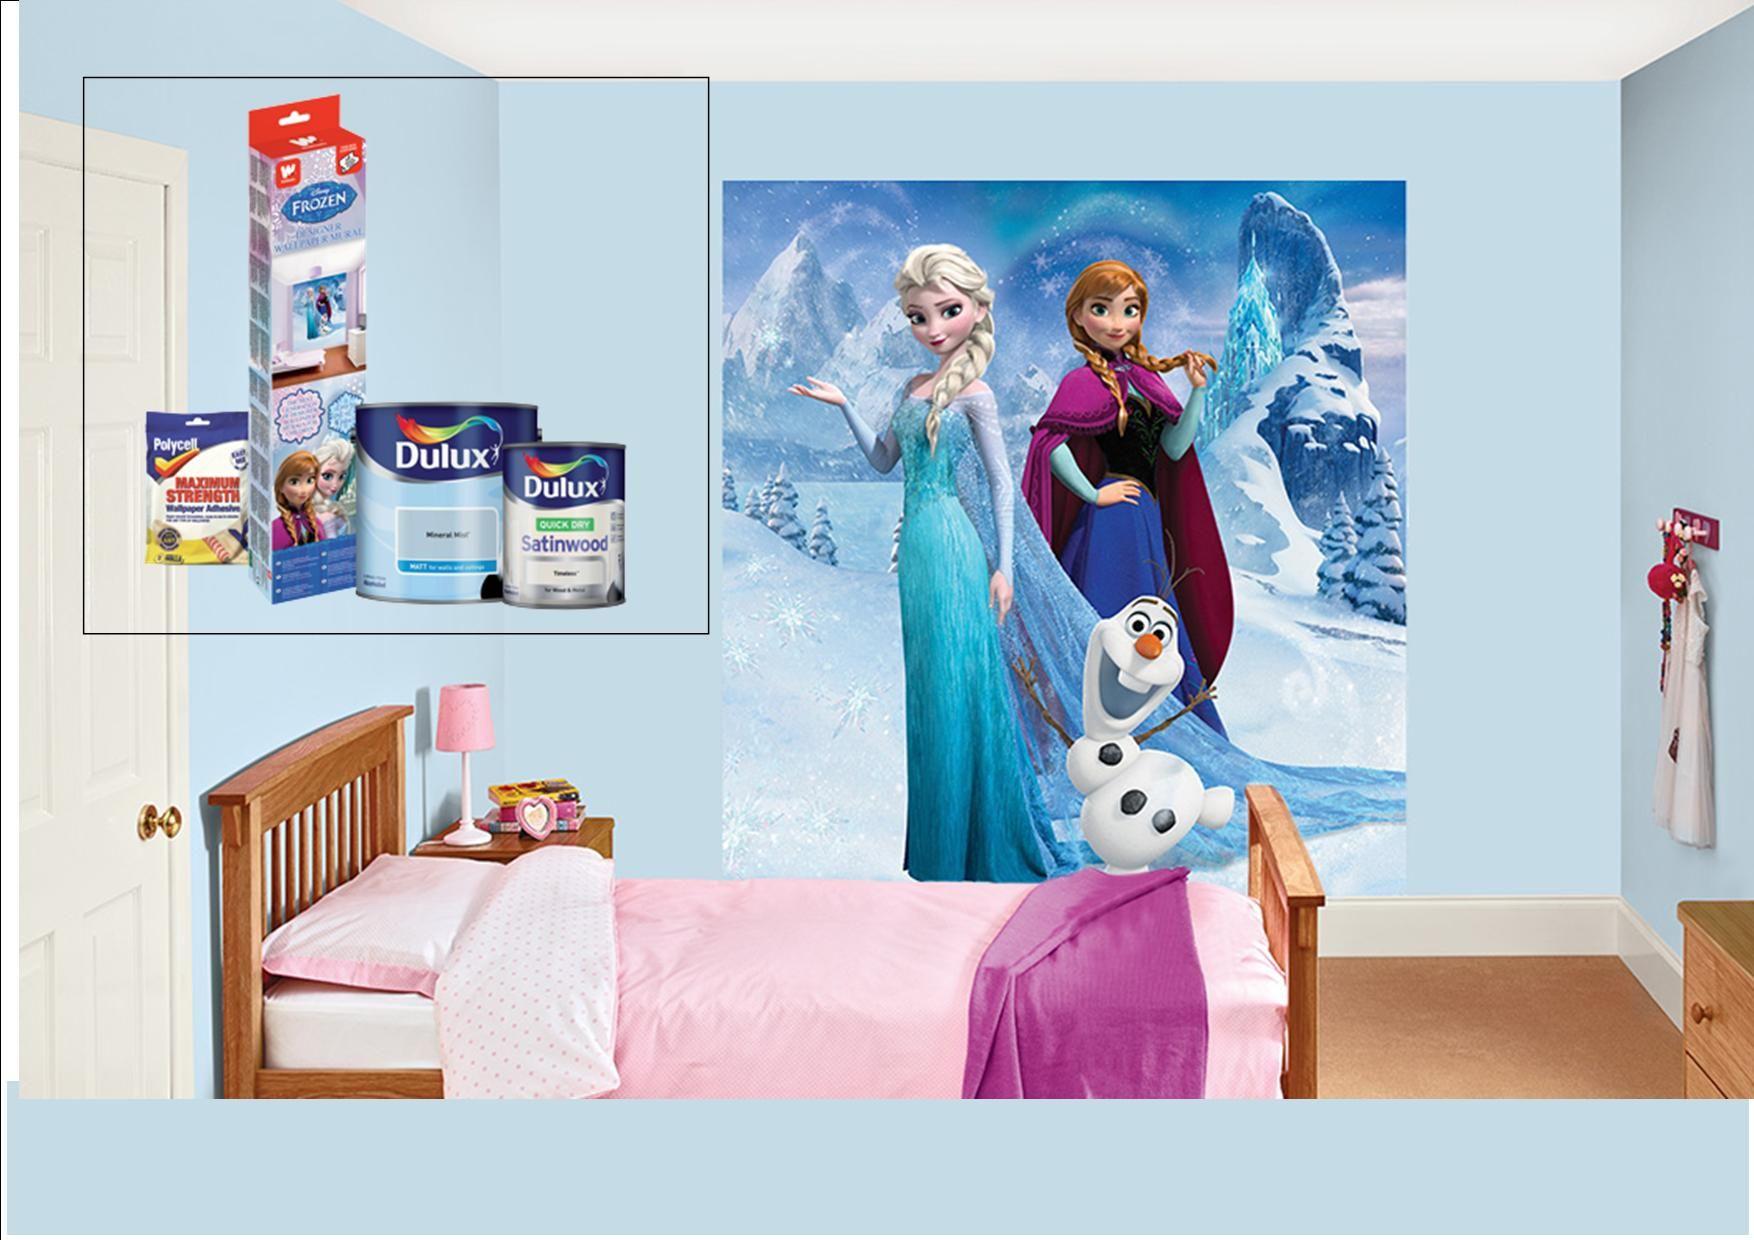 disney frozen bedroom in a box   design ideas 2017-2018 ...